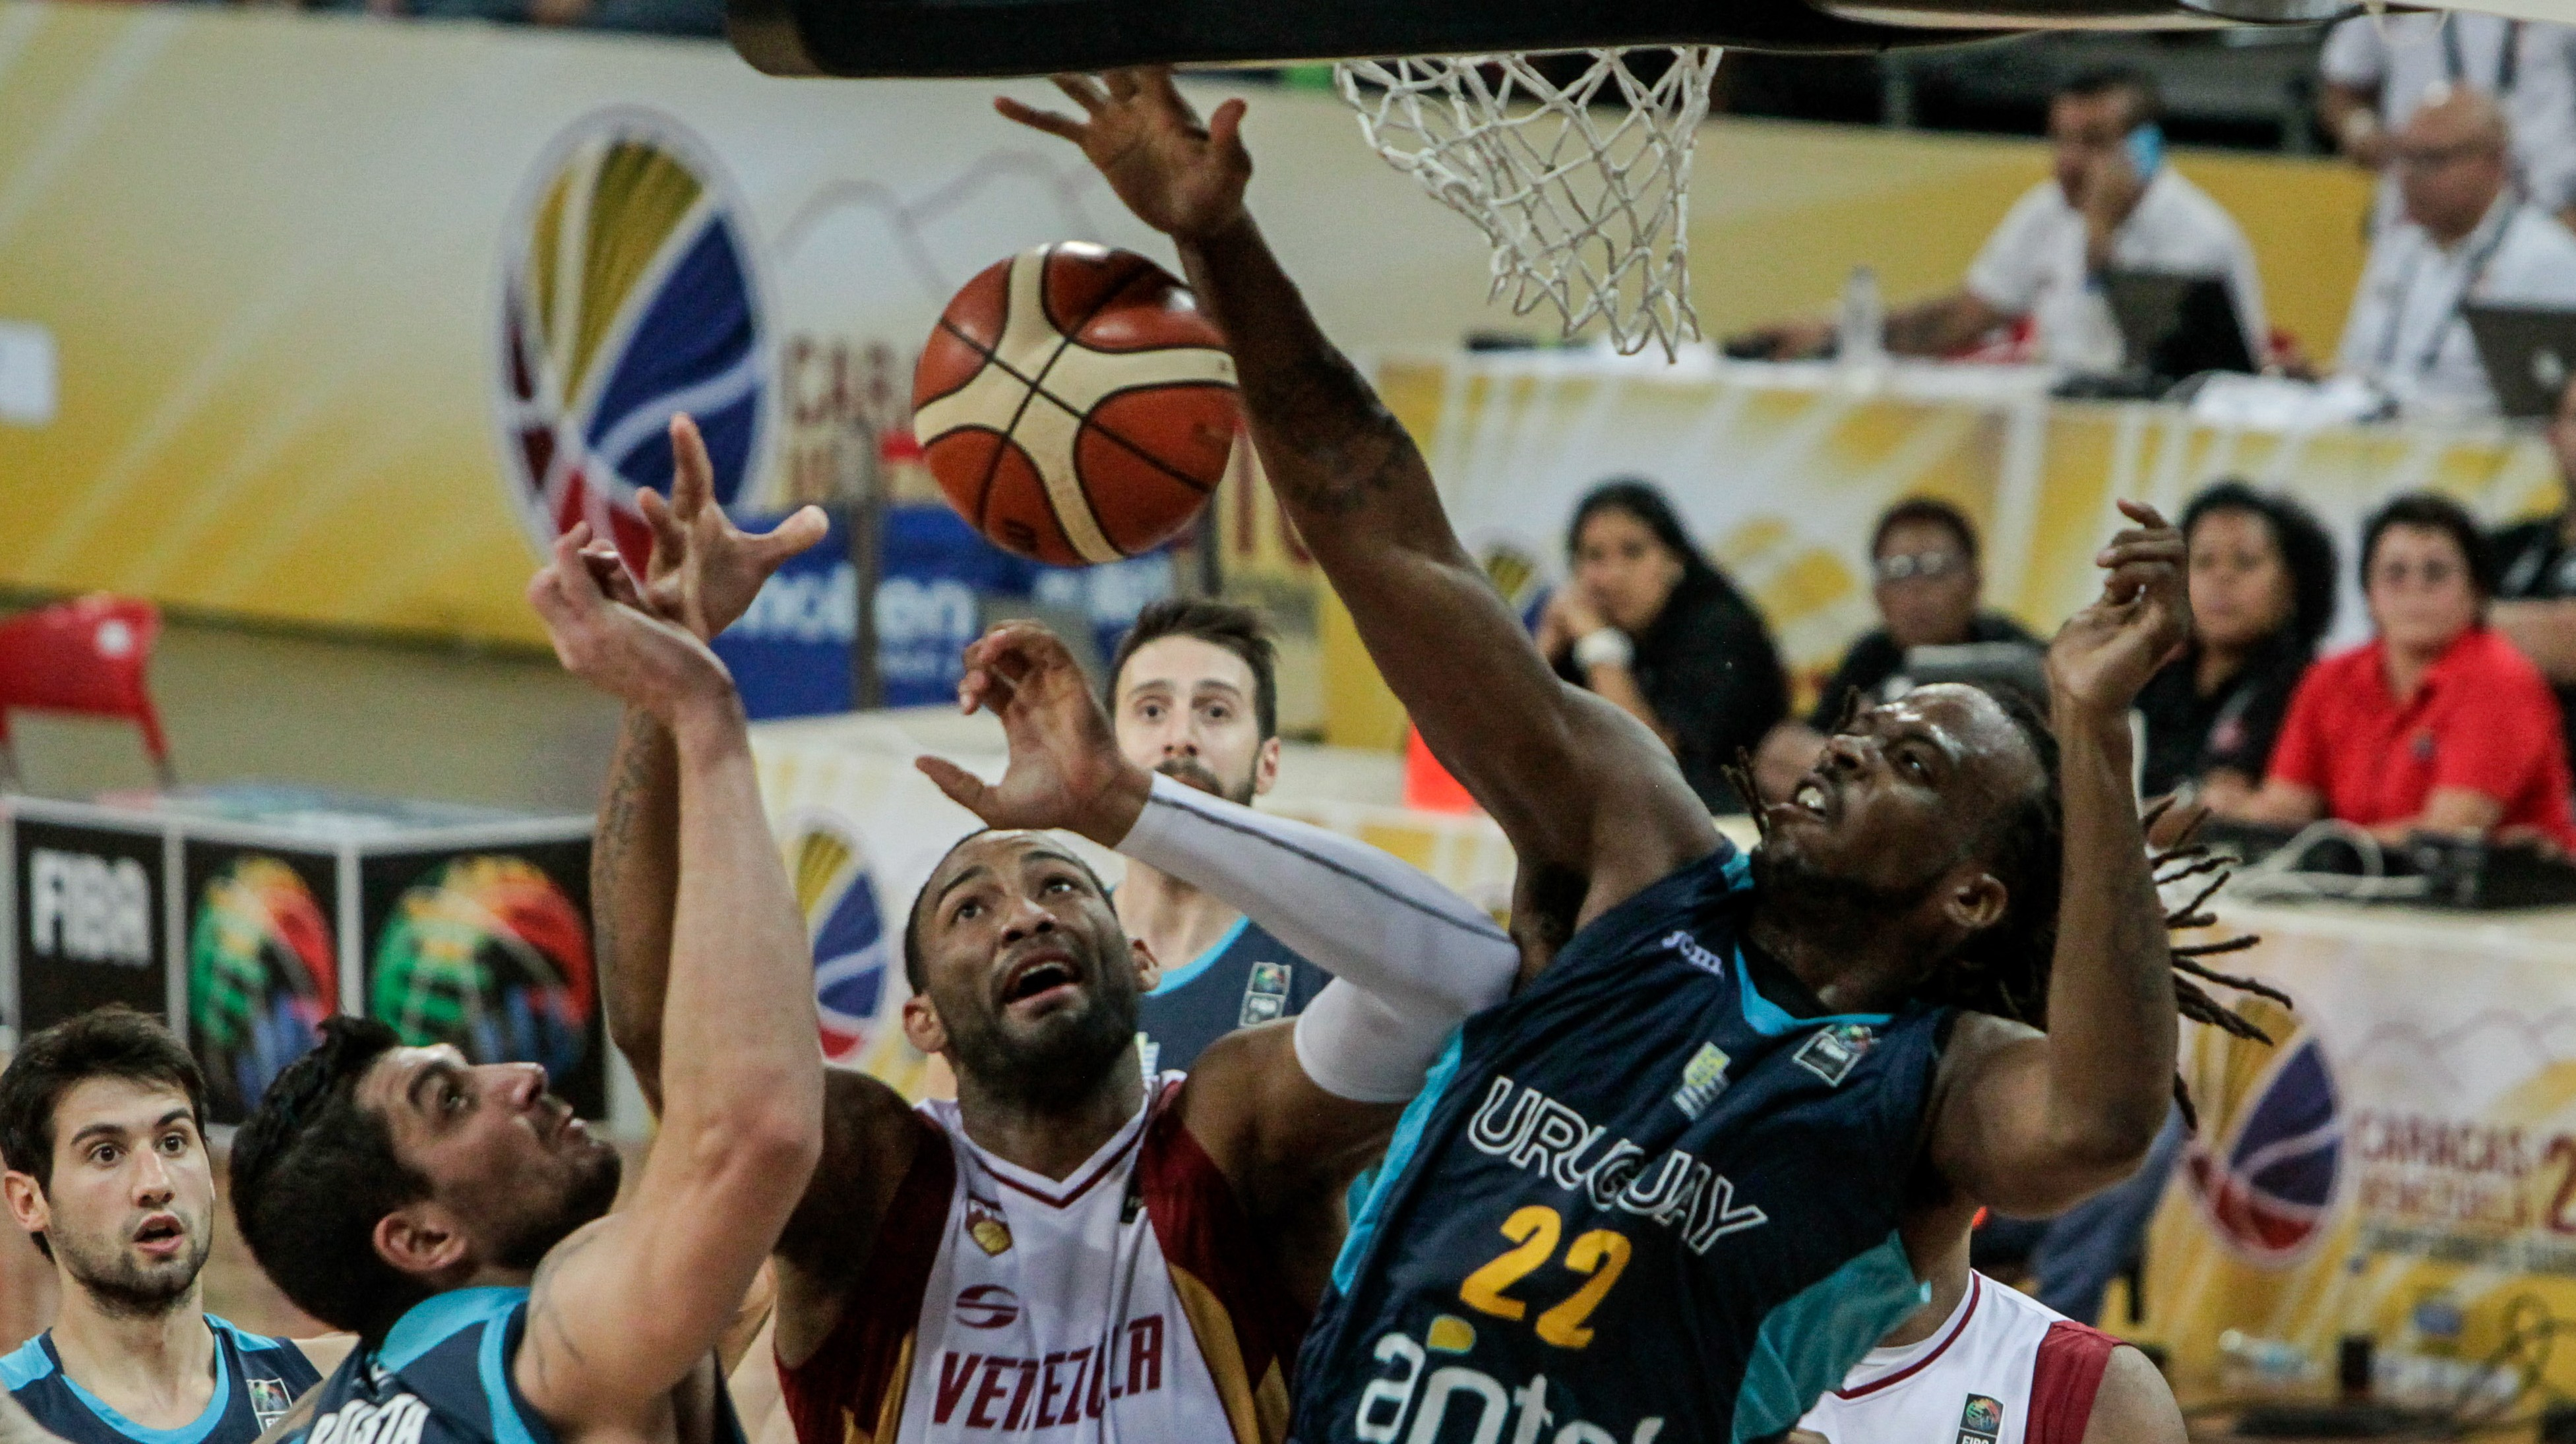 basket venzla uruguay sudamericano